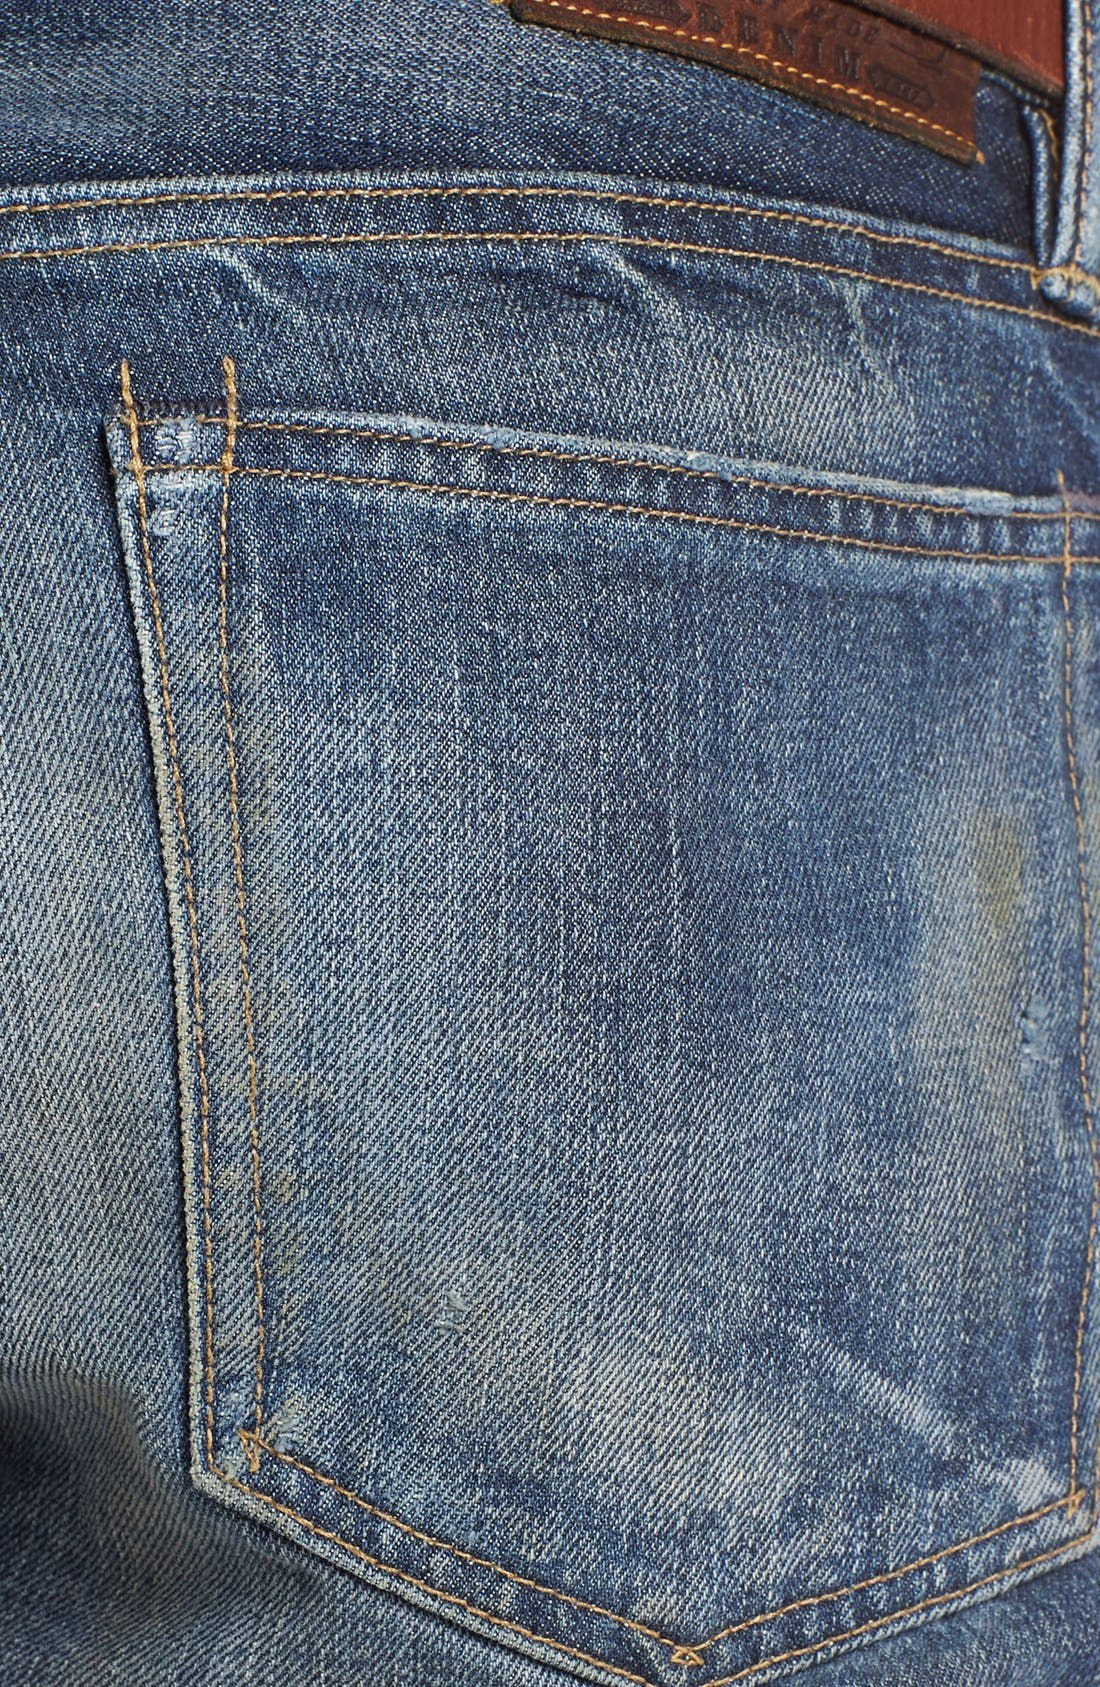 Alternate Image 3  - Polo Ralph Lauren Slim Fit Jeans (Linden Rinse)